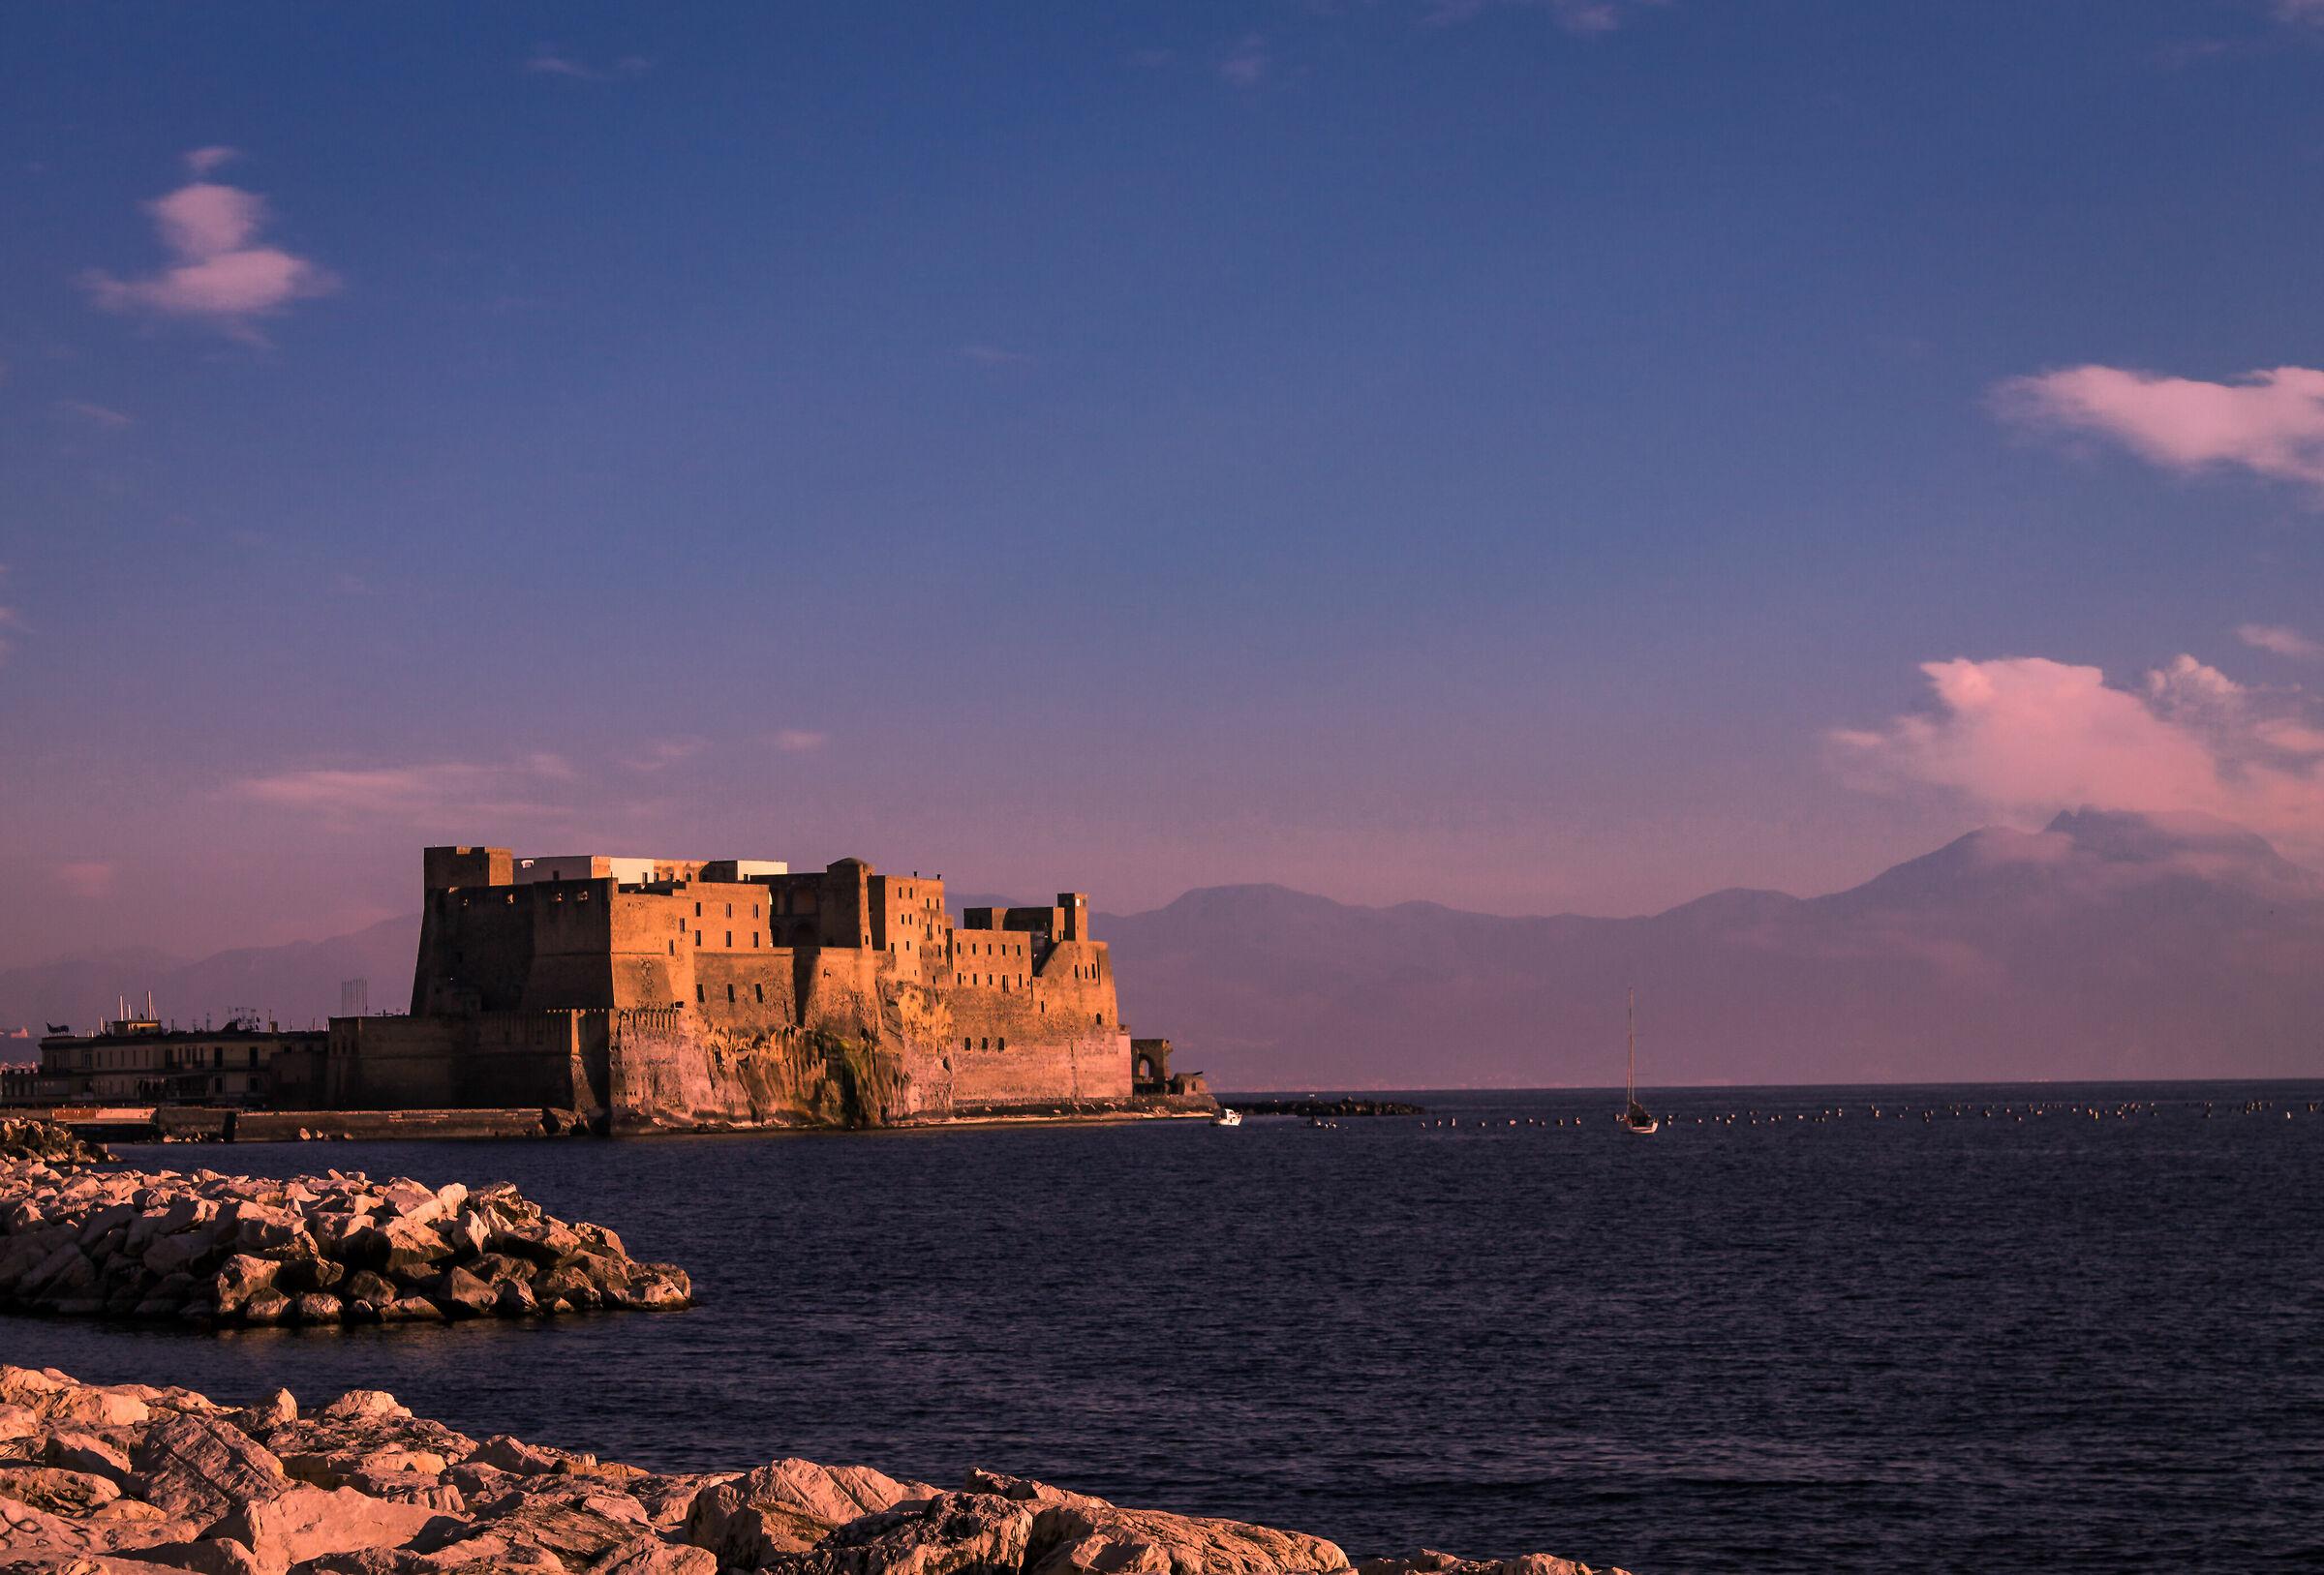 Latest lights on Castel Dell'Ovo...